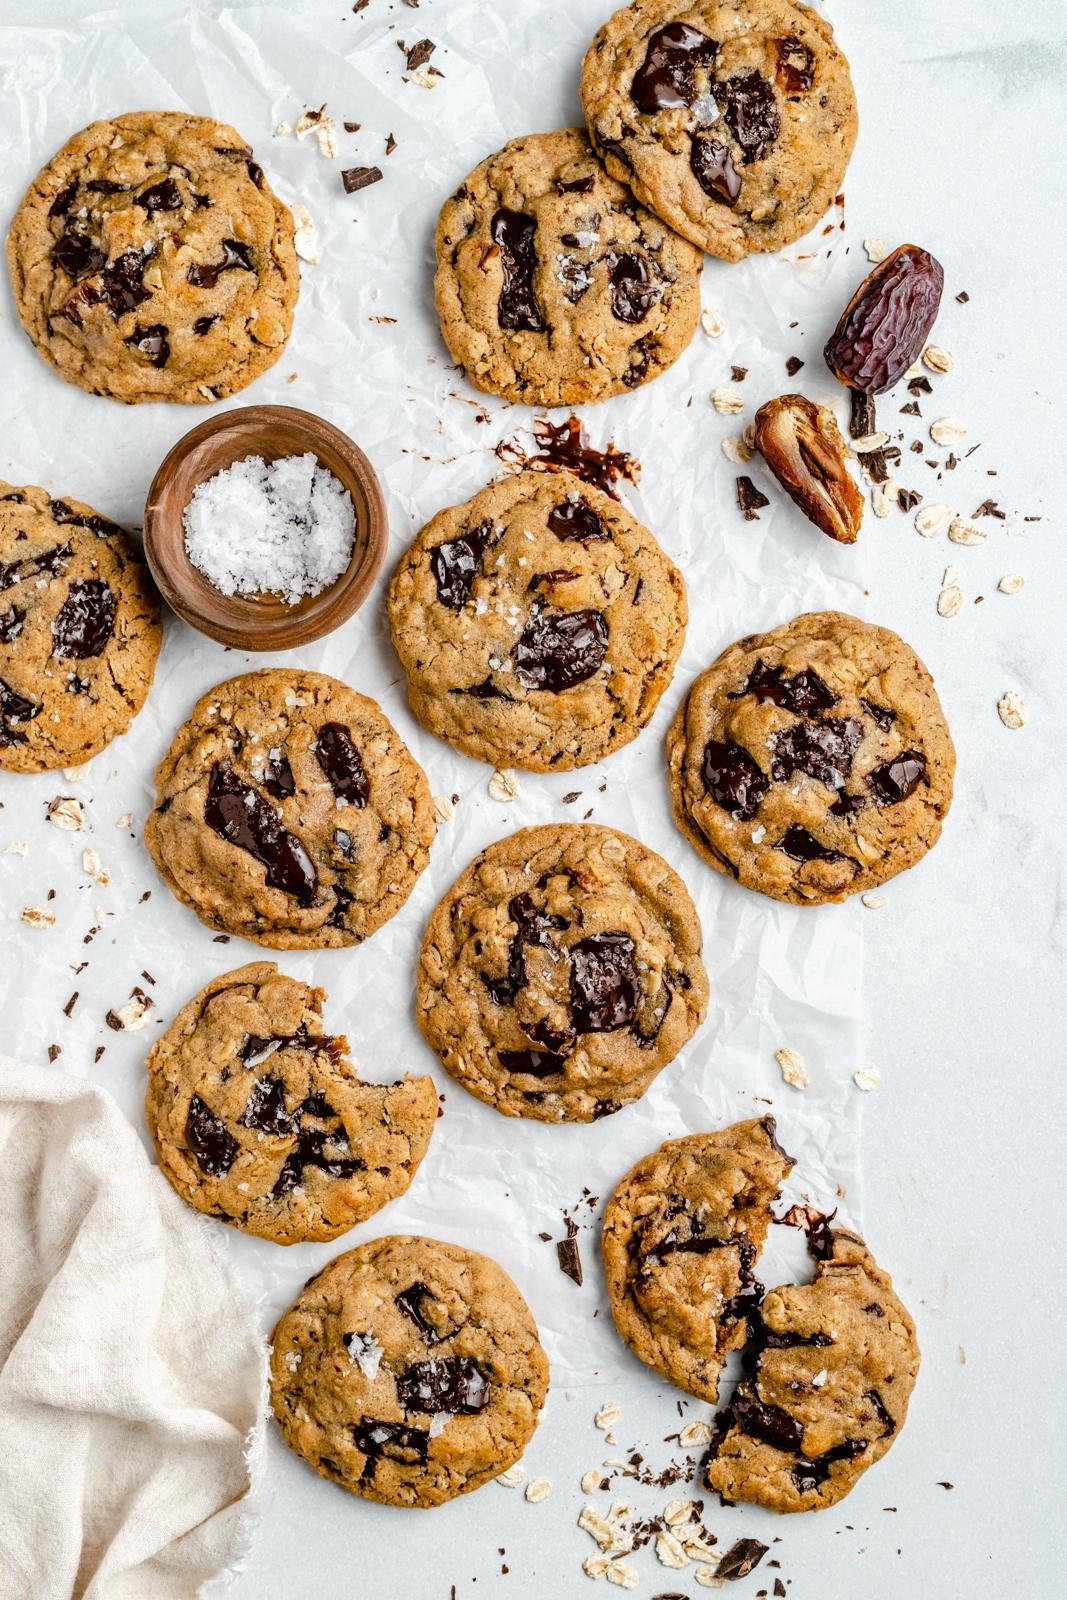 tahini date chocolate chunk cookies on wax paper